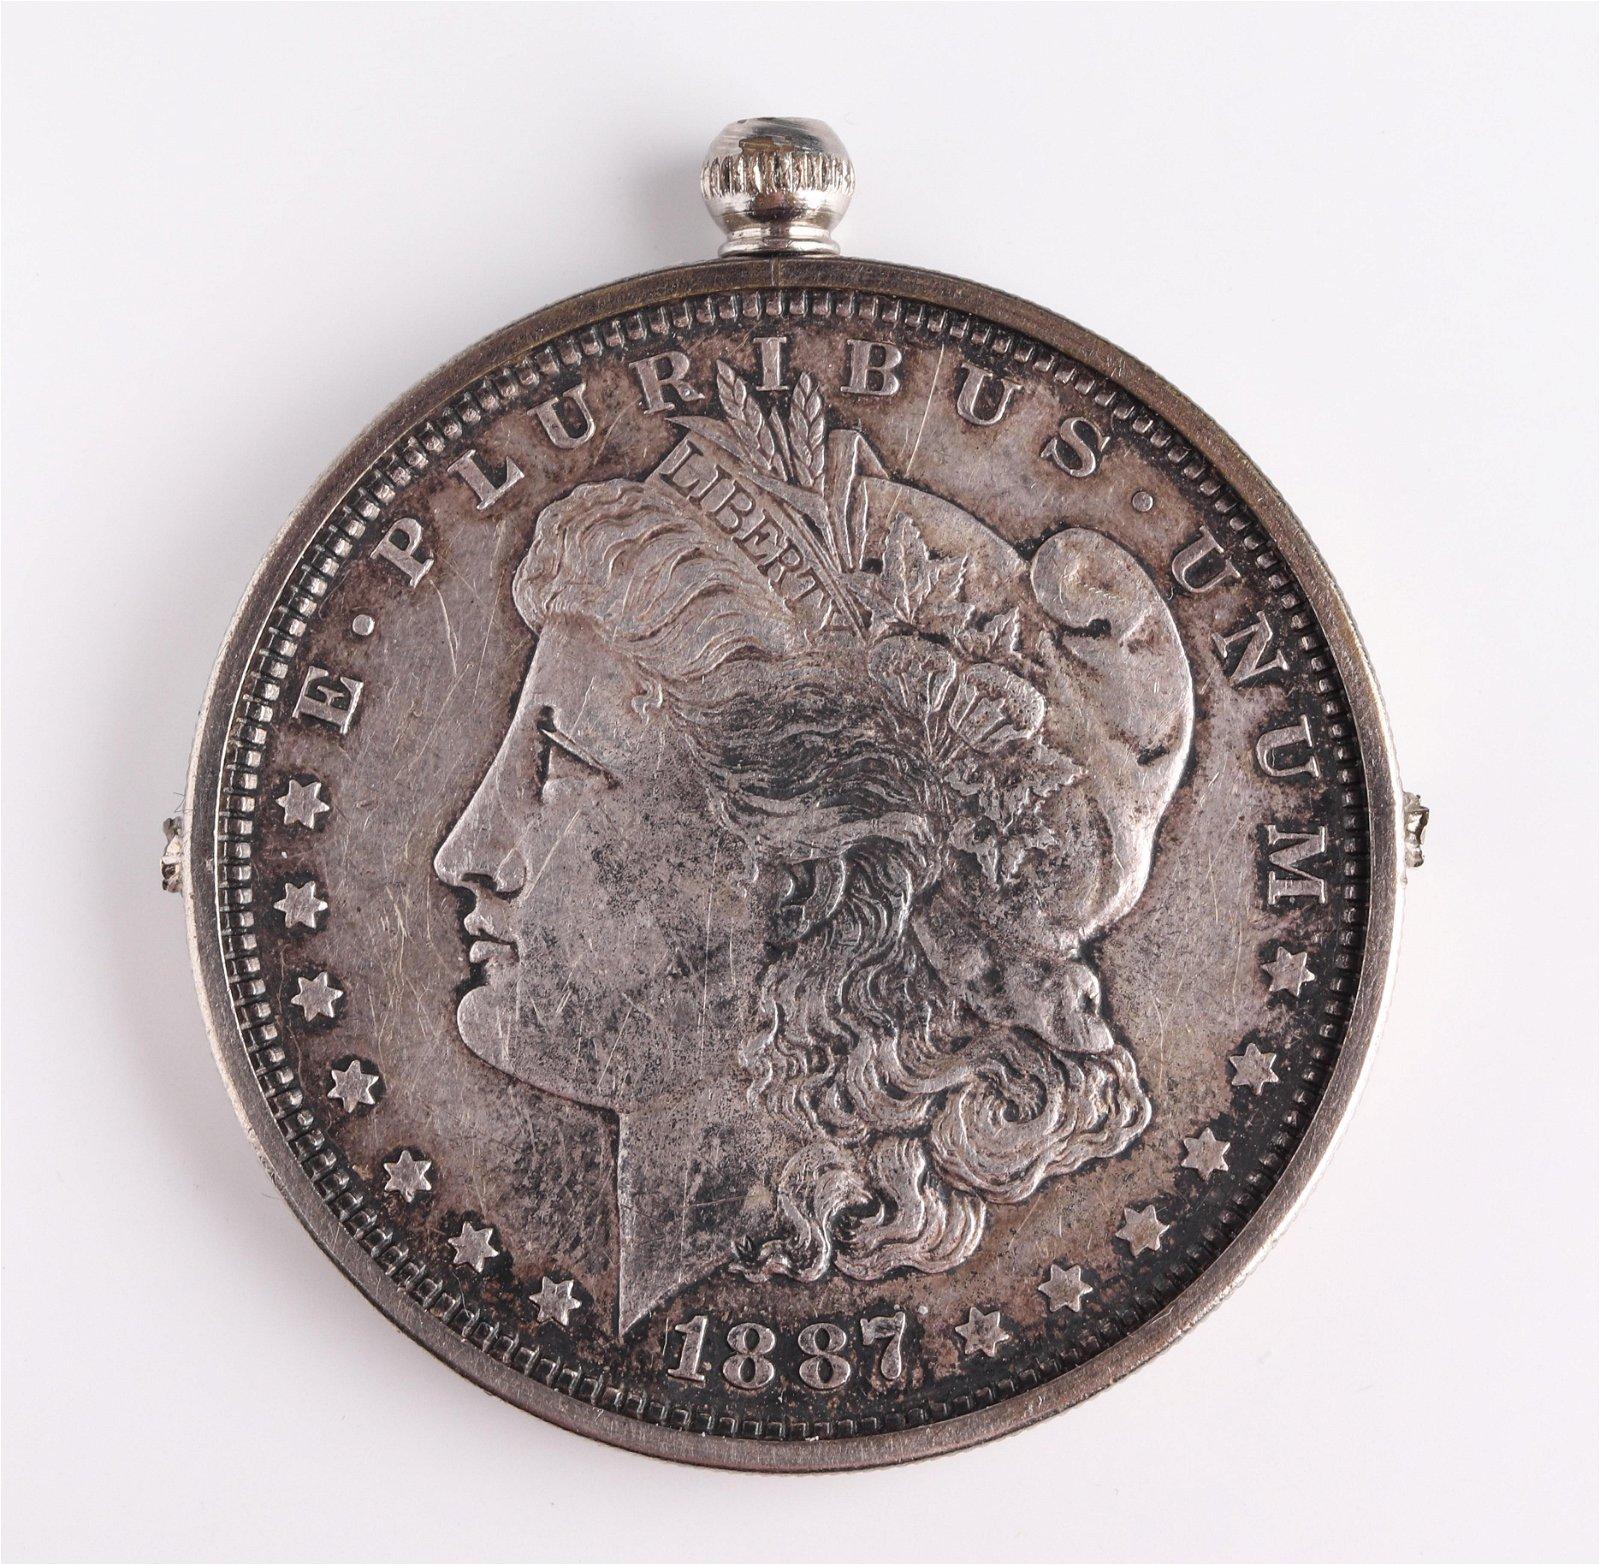 1887 Morgan $1 Silver Coin in Suspension Frame